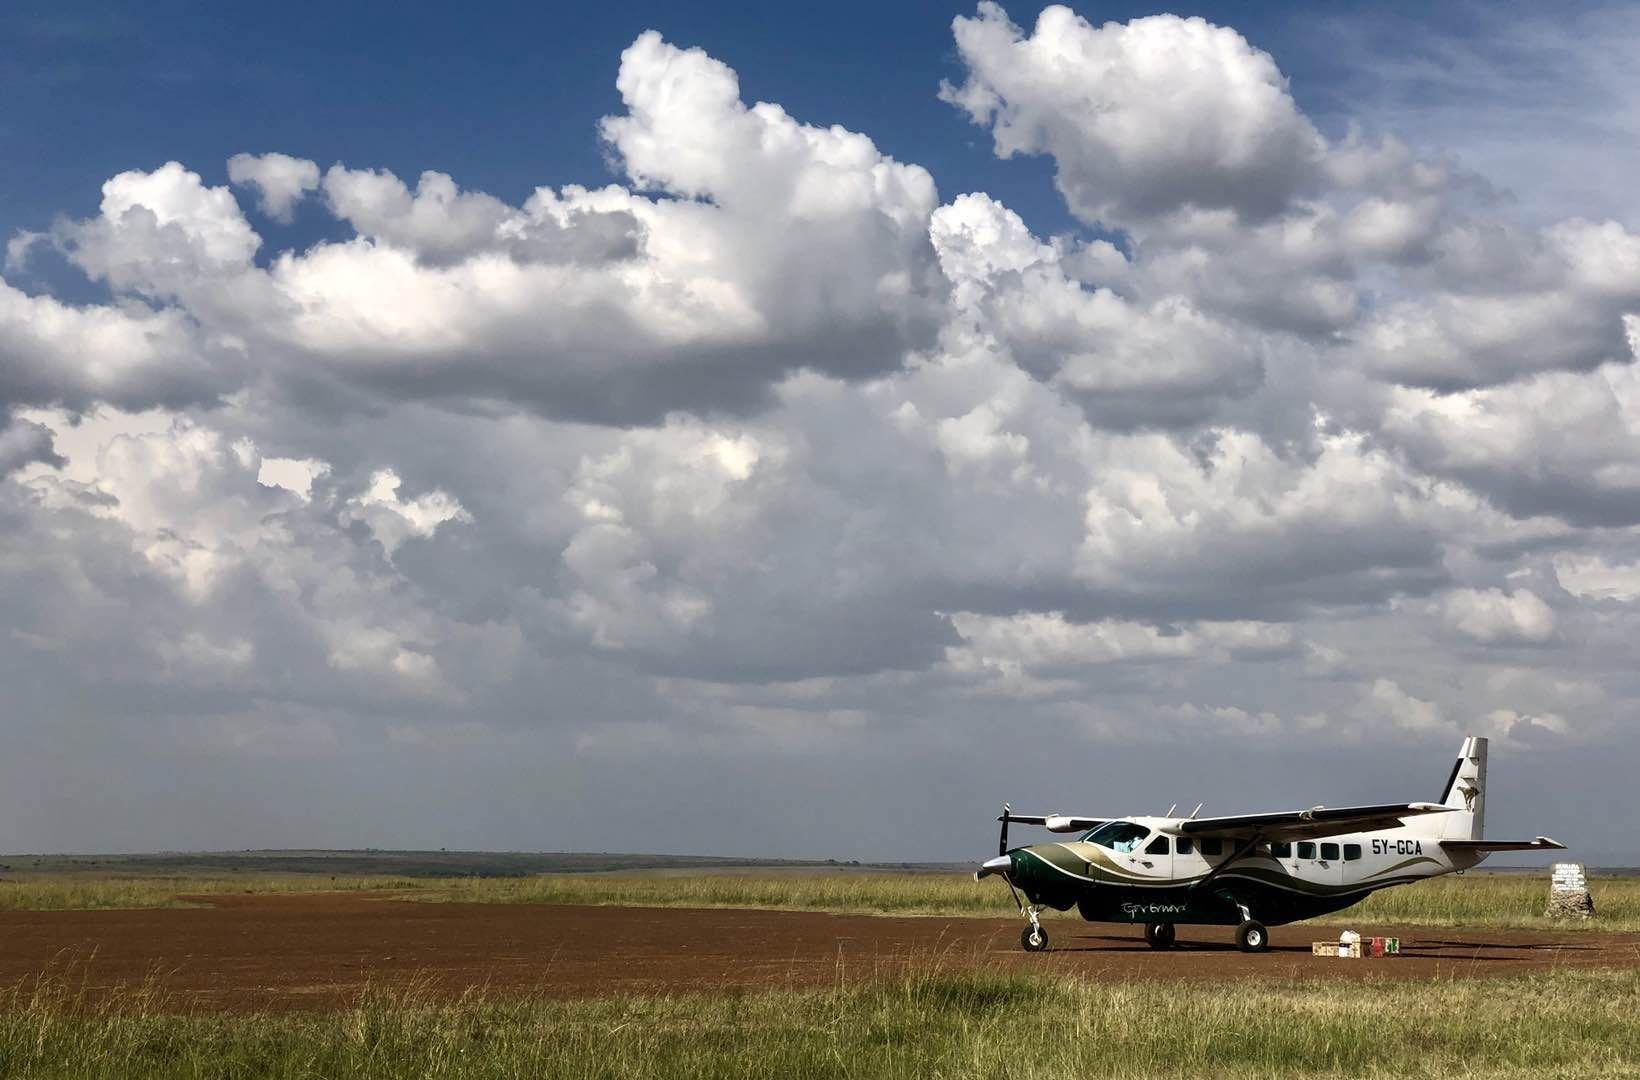 """Hello,Simba""启路未来守望栖息地肯尼亚之旅即将启程,关于野生动物大迁徙的那些知识你准备好了吗?"